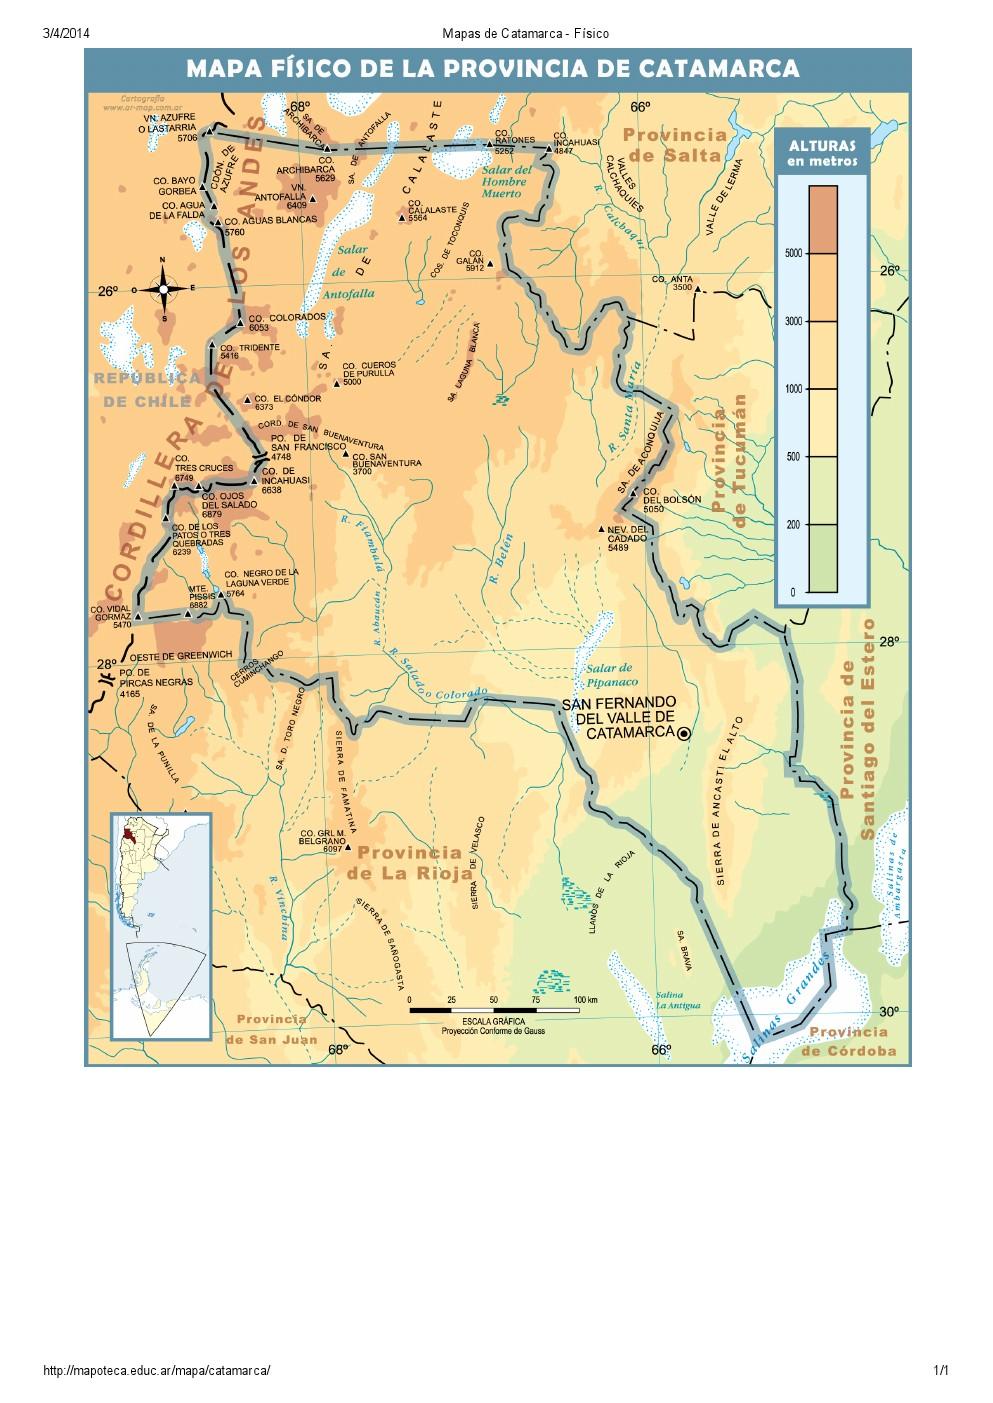 Mapa de ríos de Catamarca. Mapoteca de Educ.ar